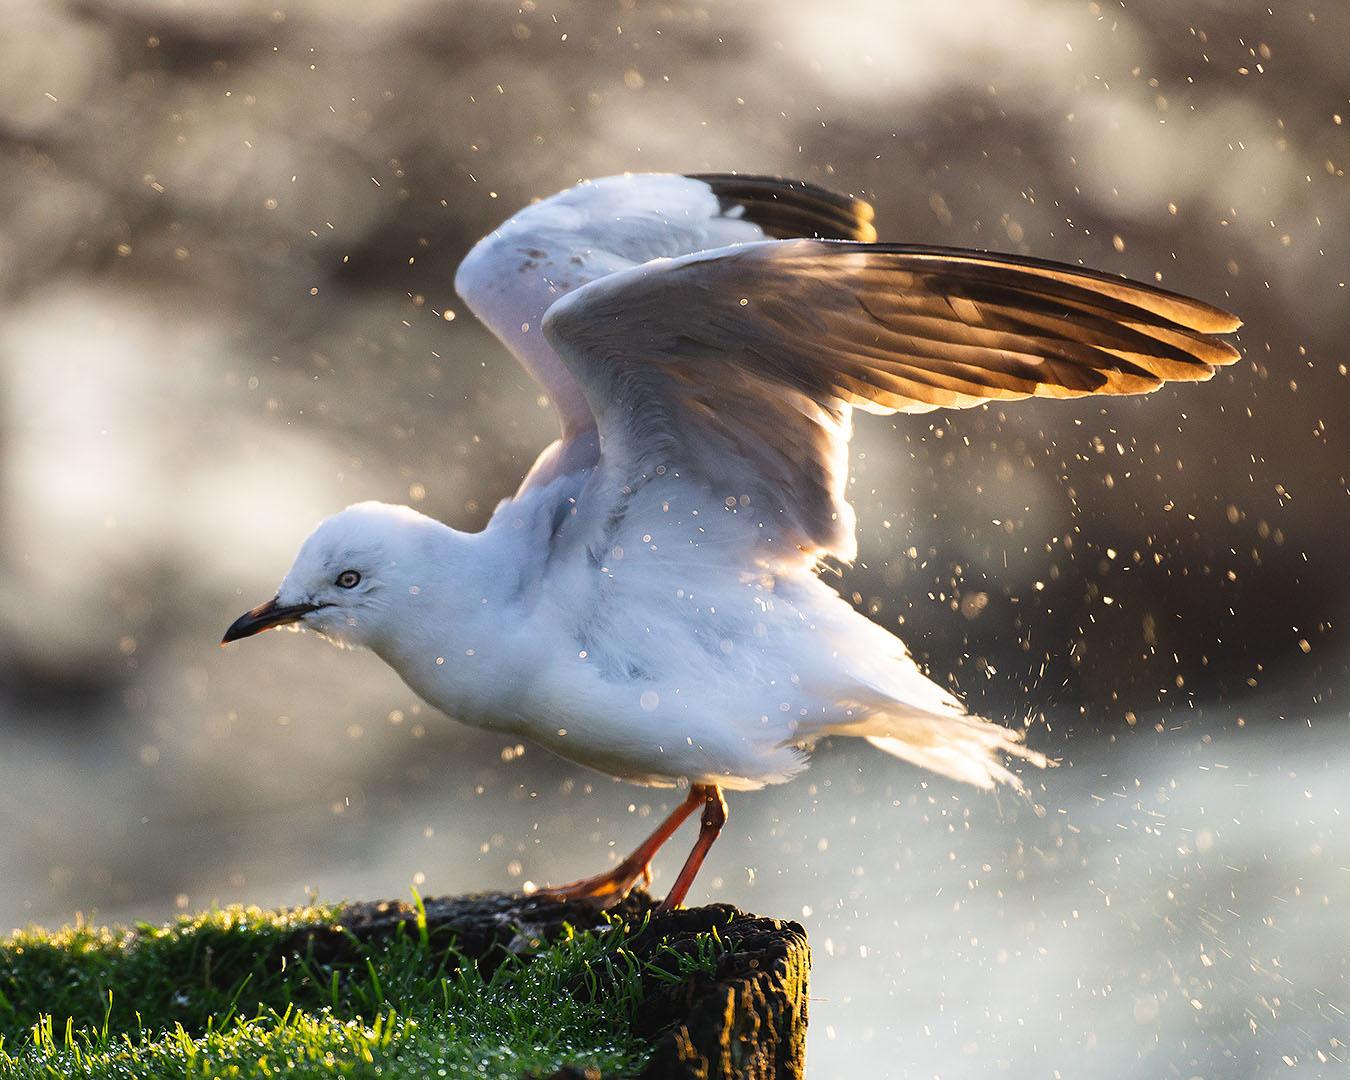 A native bird spotted at Rotorua's Sulphur Point.